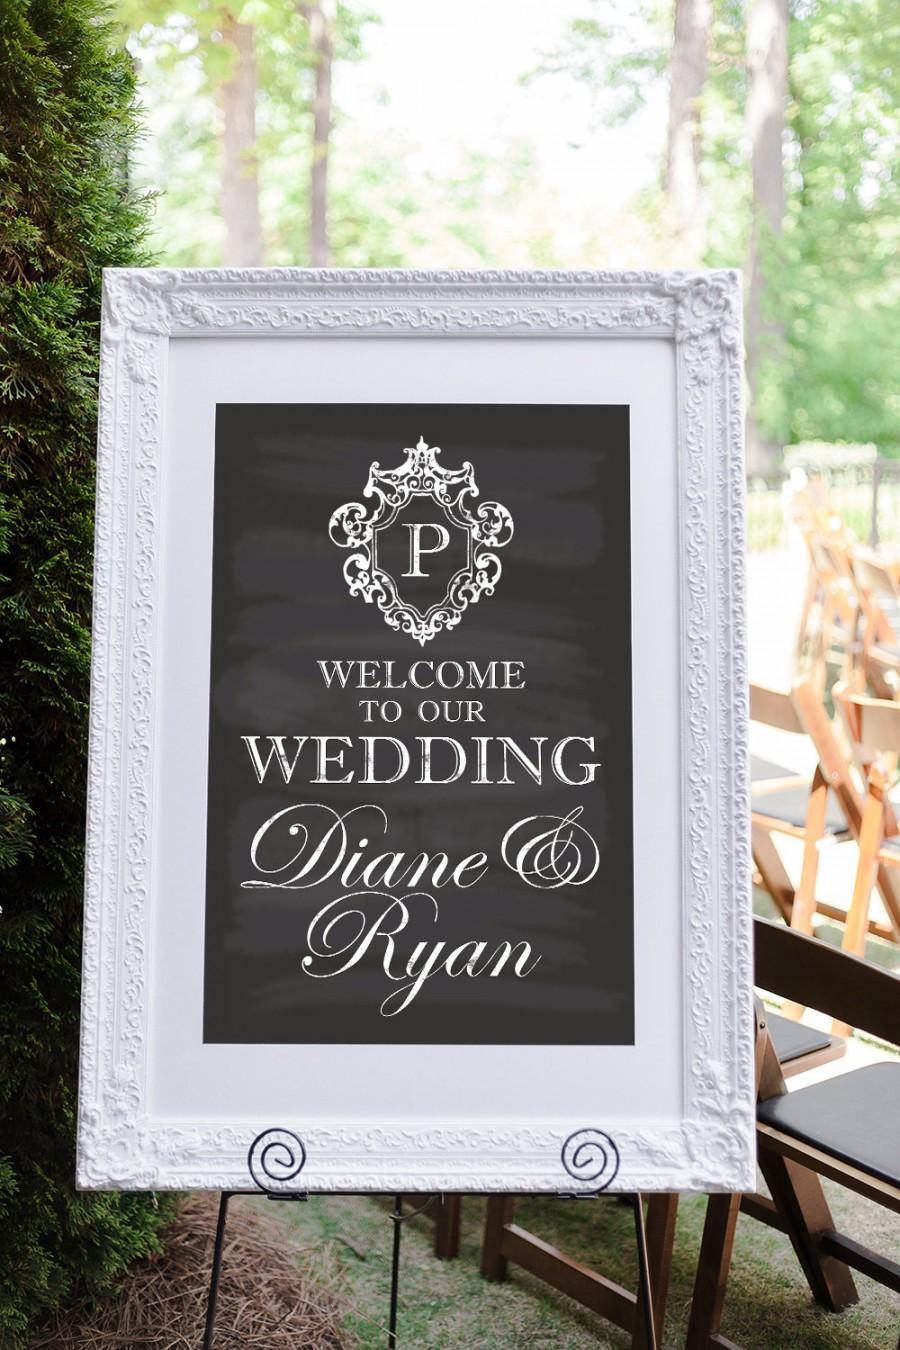 Свадьба - Welcome to Our Wedding Sign, Wedding Welcome Sign, Welcome to Our Wedding, Vintage Wedding, Chalkboard Wedding Sign, Monogrammed Wedding